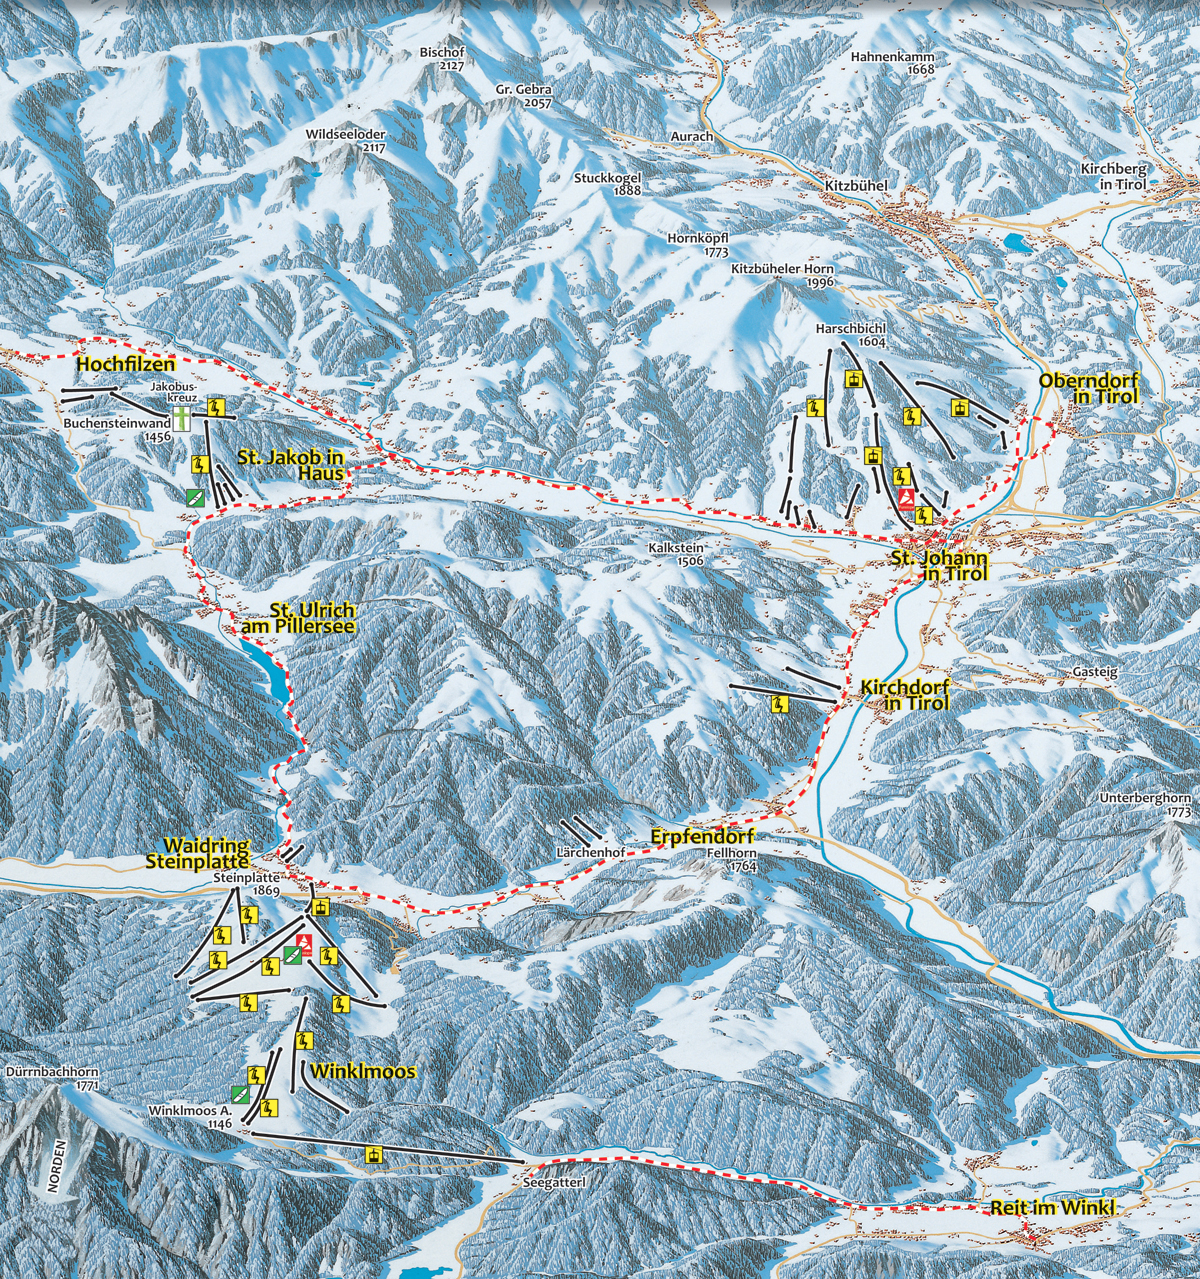 Schneewinkel - Tyrolsko